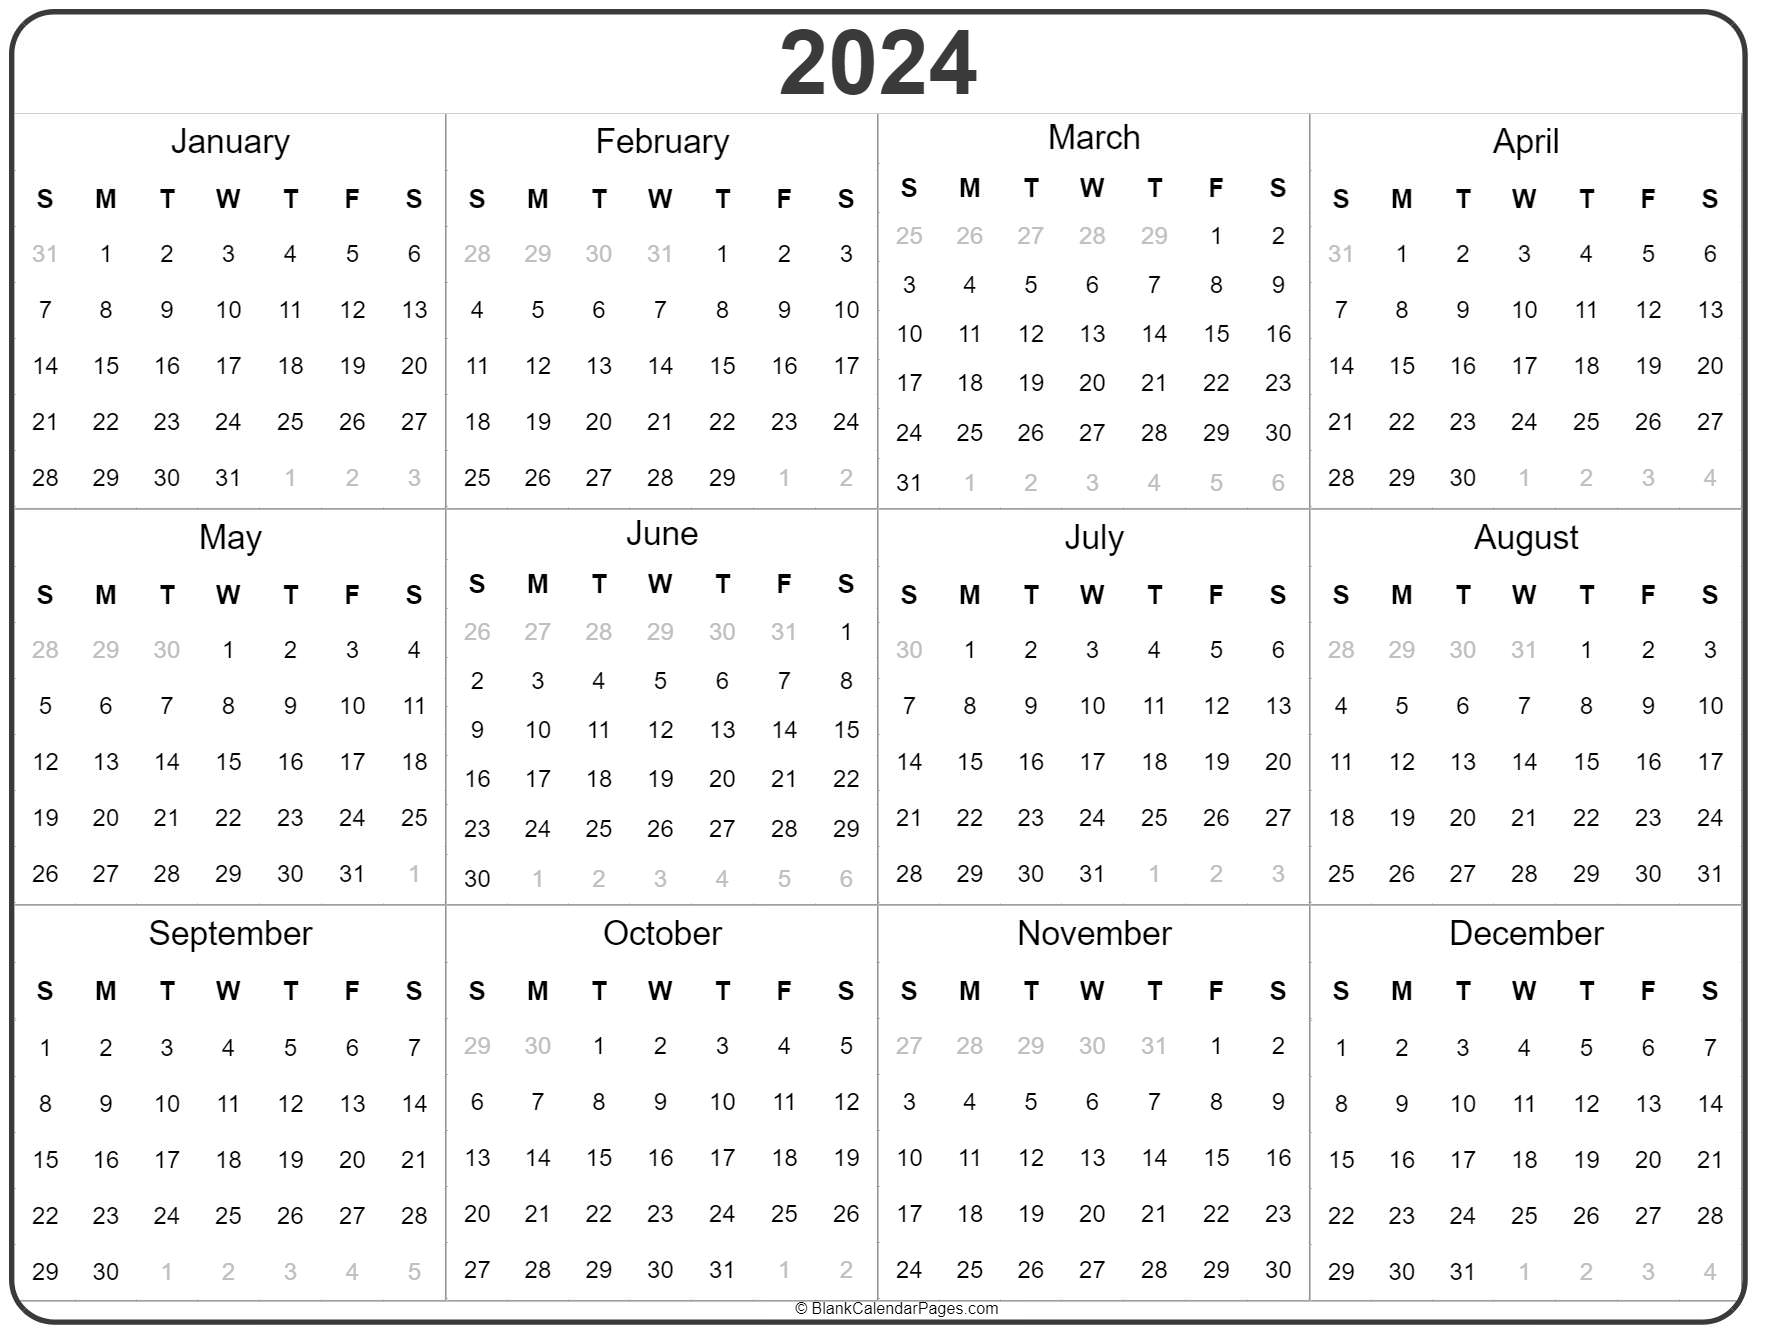 2024 Year Calendar Yearly Printable